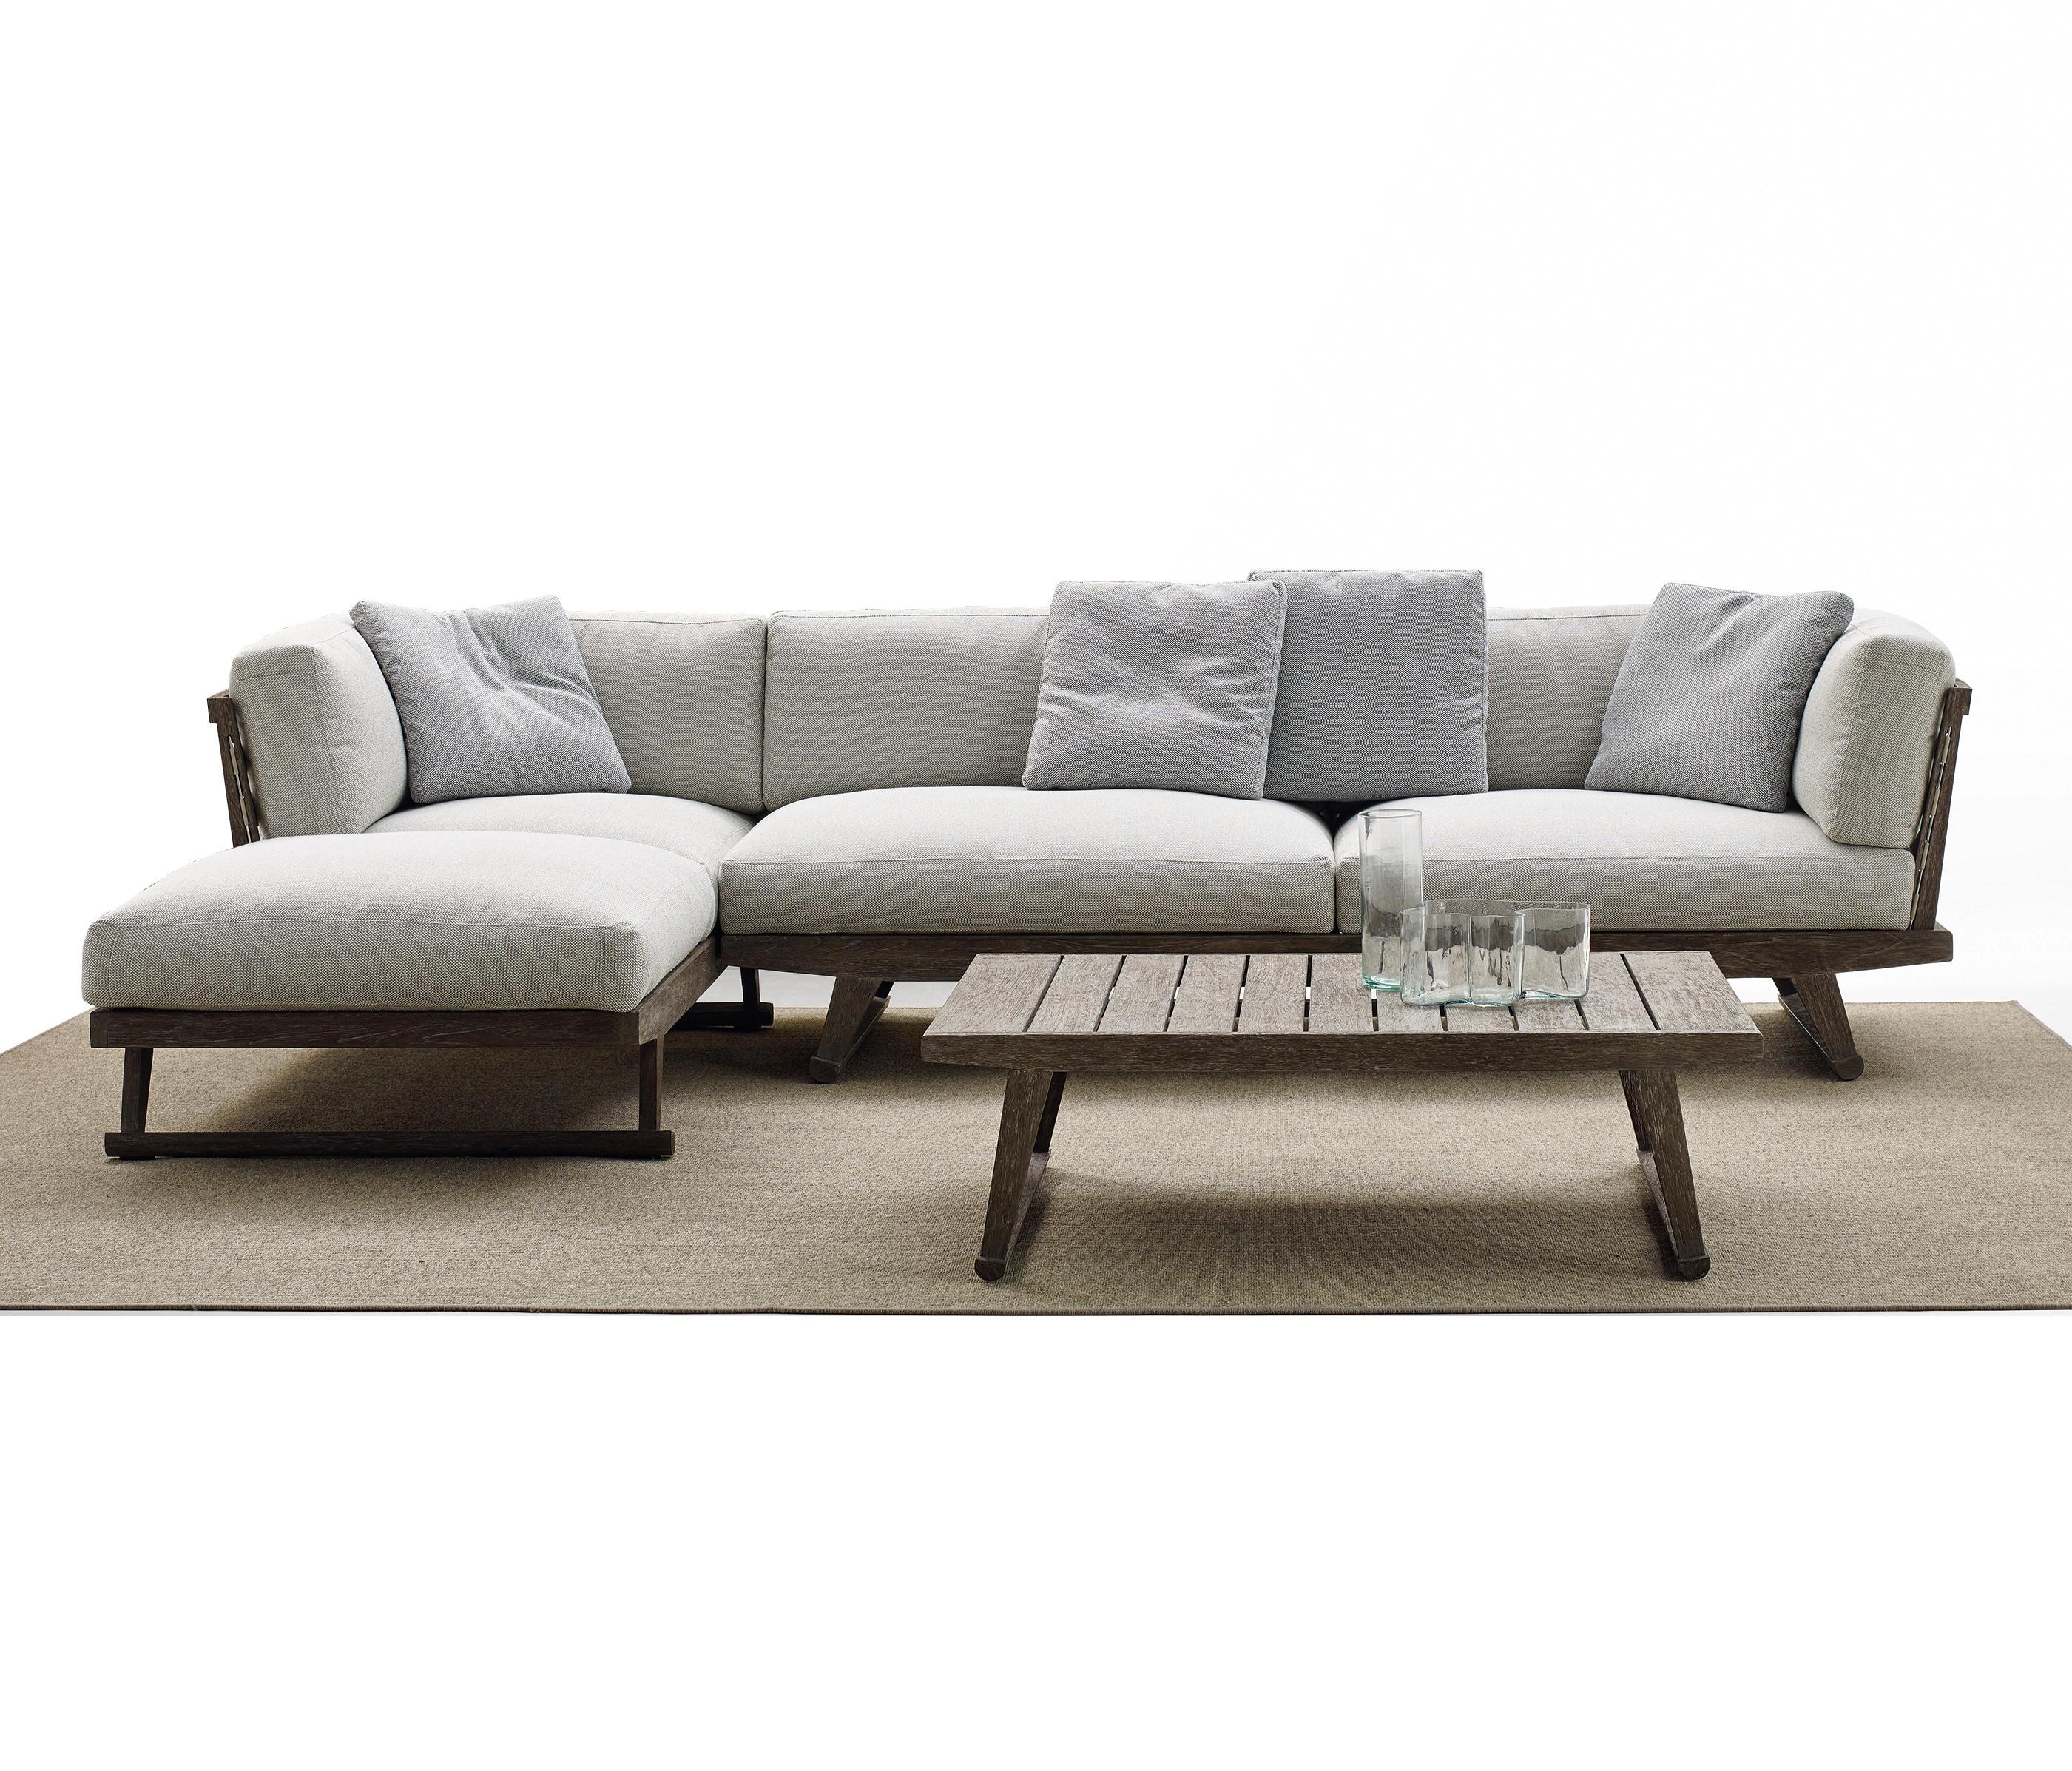 Gio sofa canap s de b b italia architonic for B b italia novedrate